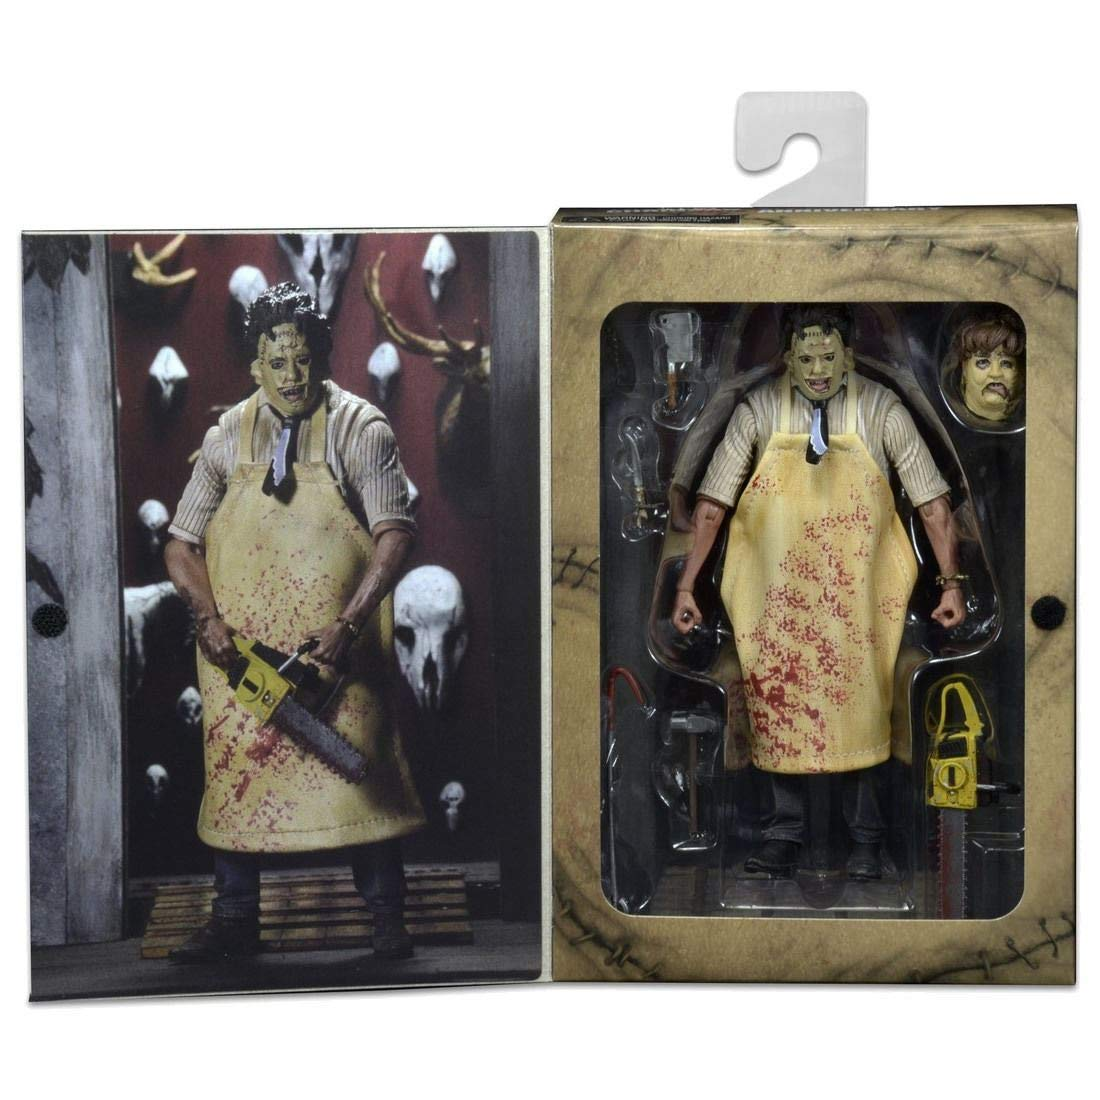 "NECA Texas Chainsaw Massacre7"" Ultimate Leatherface Action Figure"